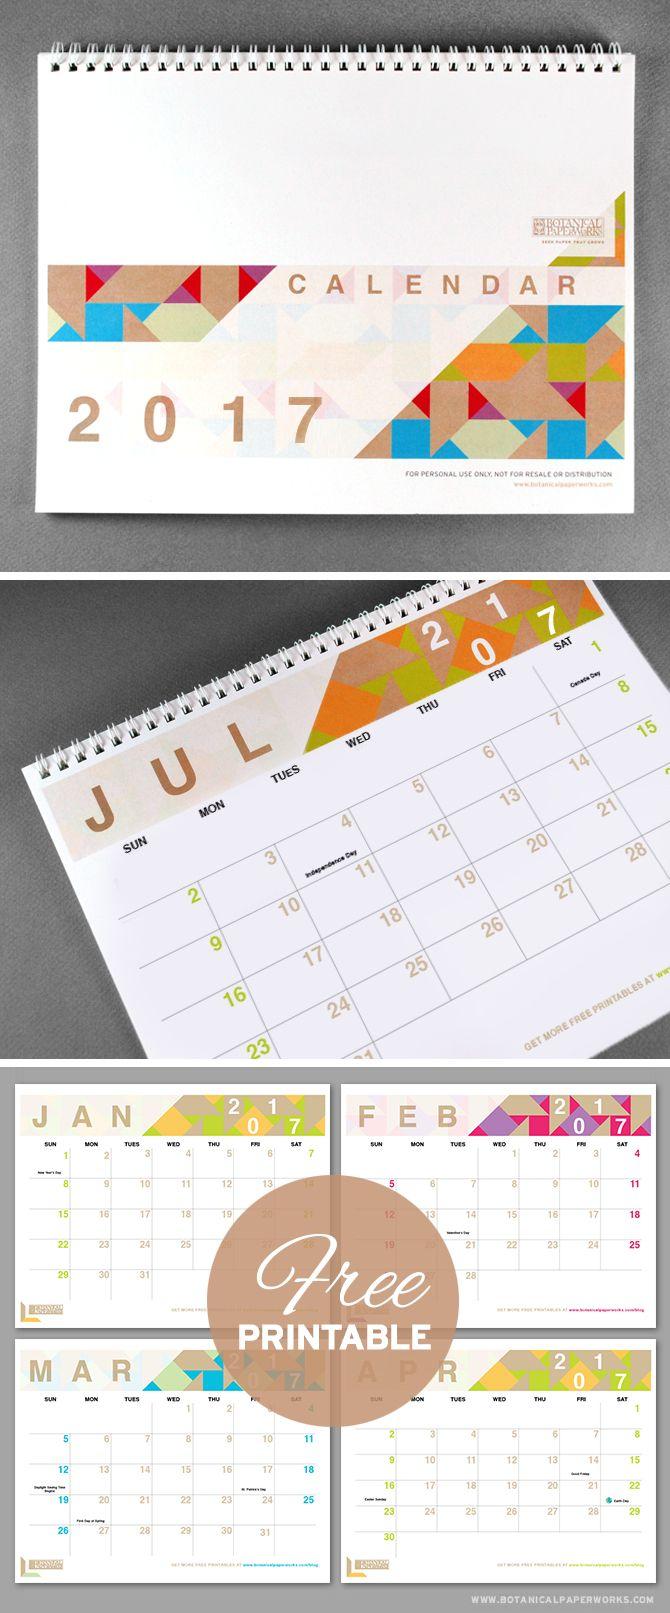 Geometric FREE printable calendar